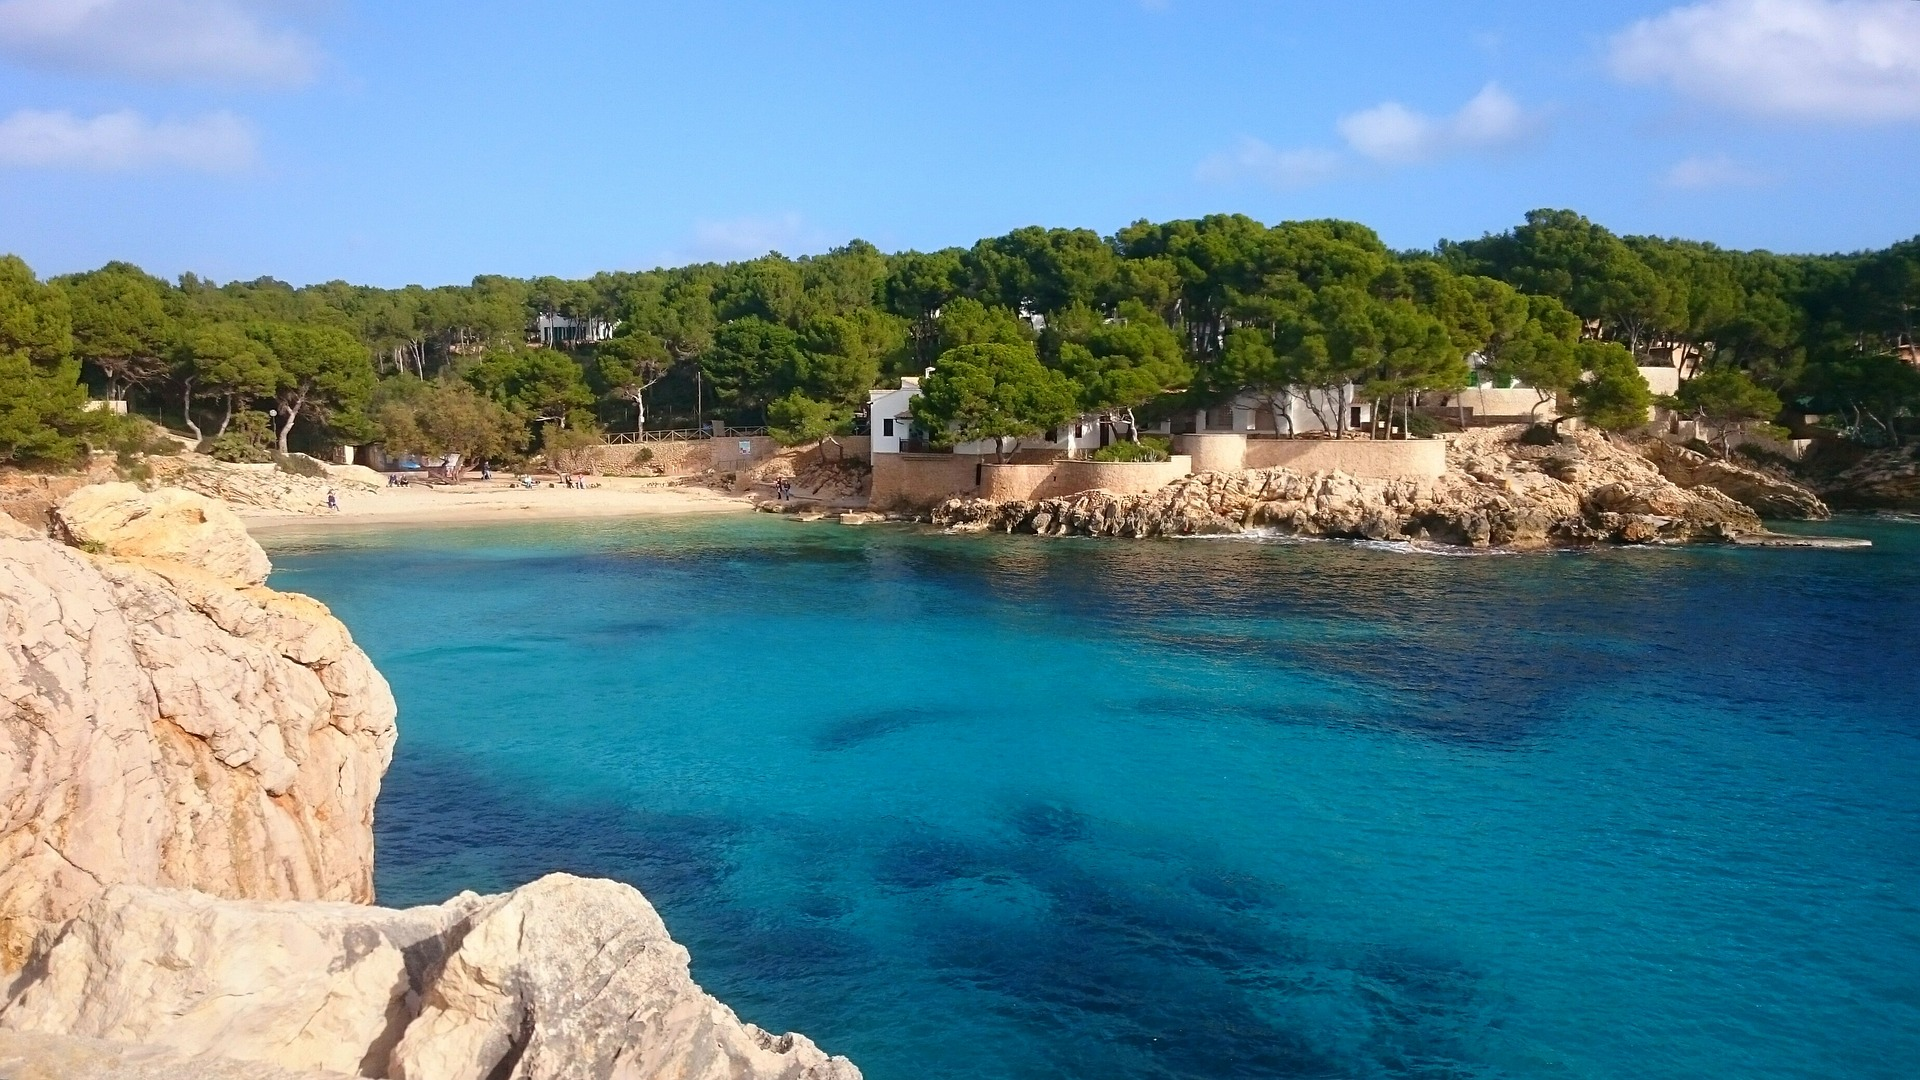 Mallorca Urlaub 2019 - Flug 7,99€ & Hotel 13,00€ - Malledeals